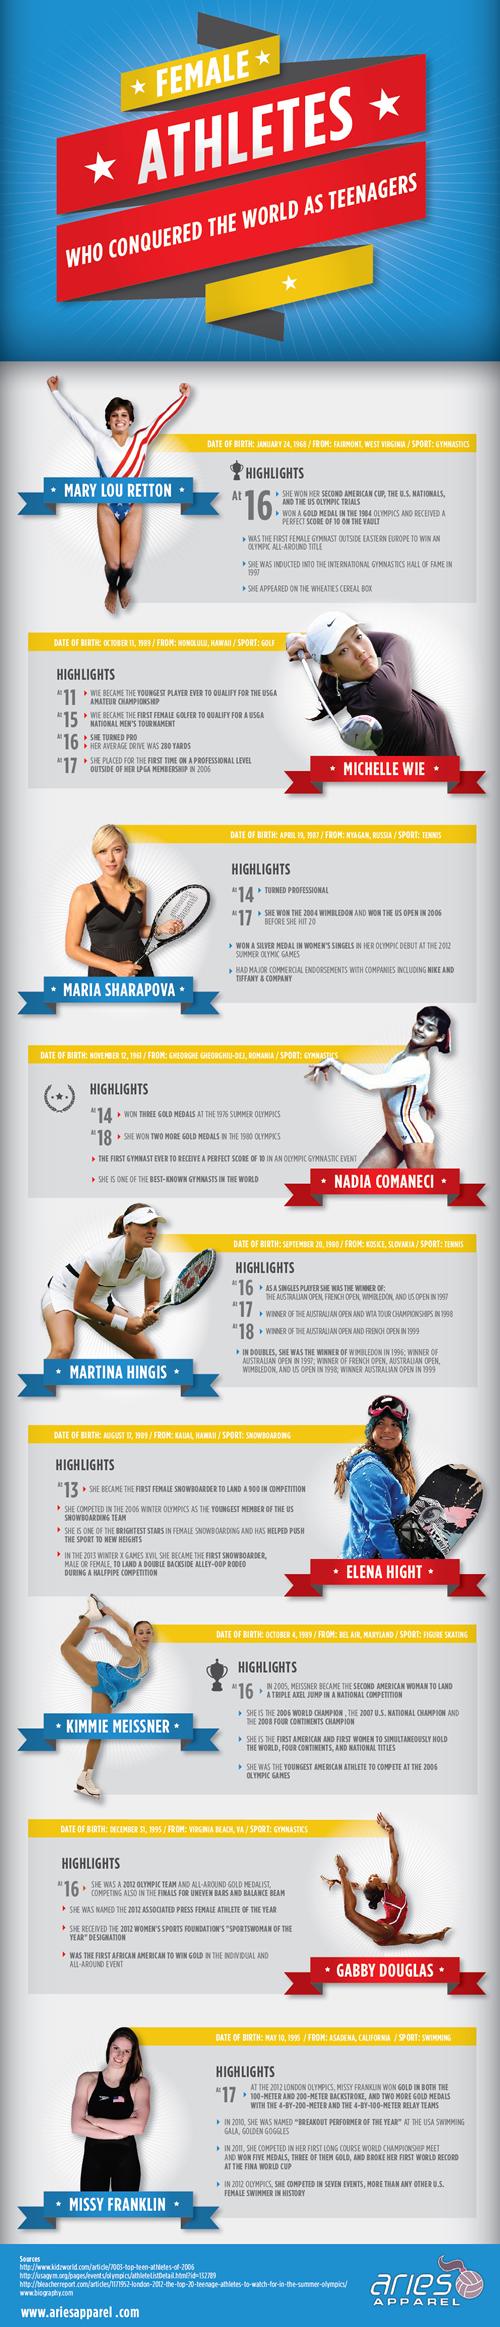 Female Athletes Famous teenagers